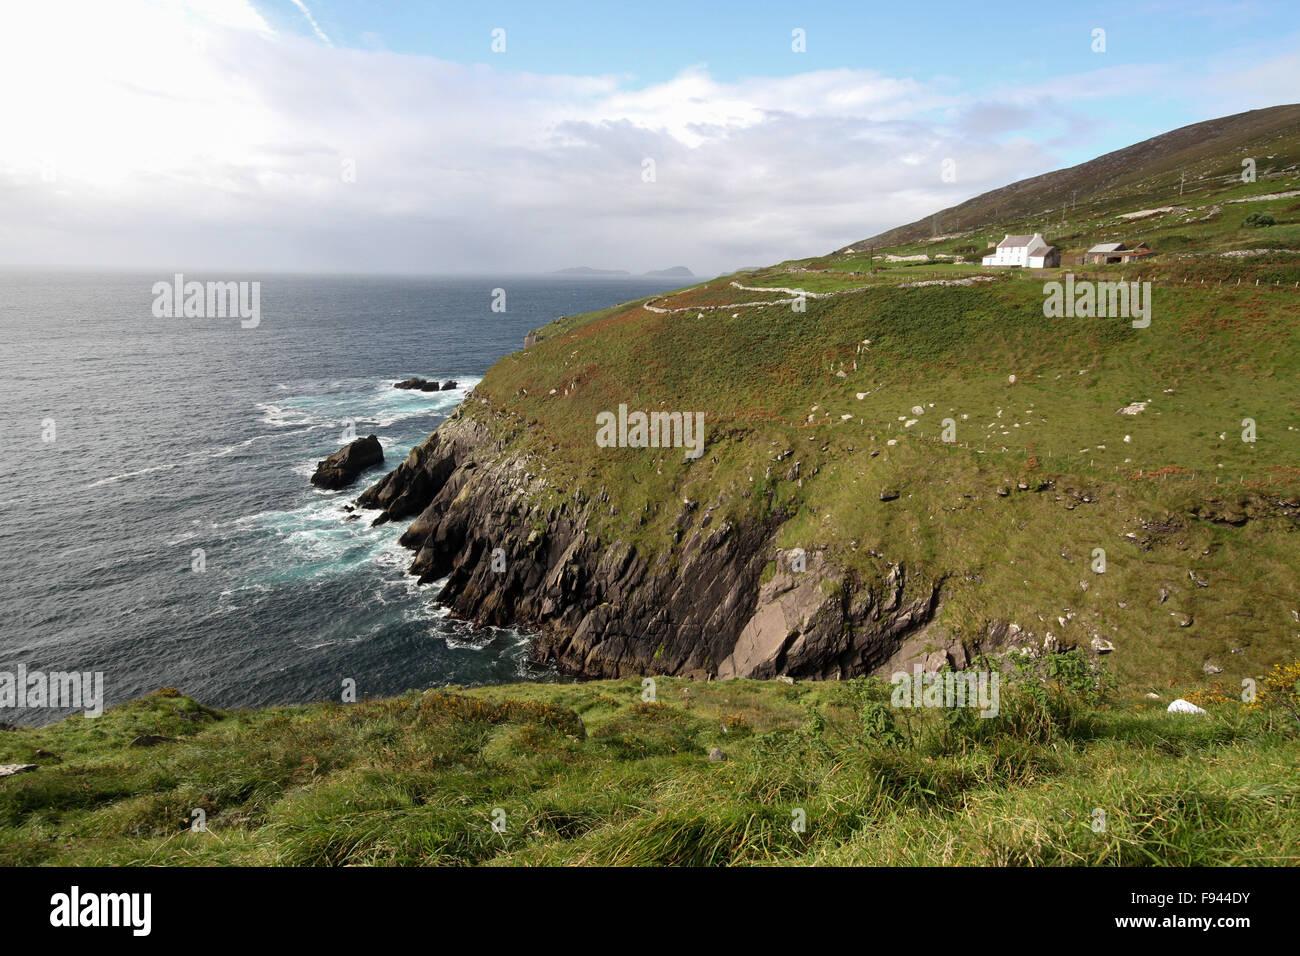 The west coast of Ireland at Slea Head on the Dingle Peninsula, County Kerry, Ireland - Stock Image